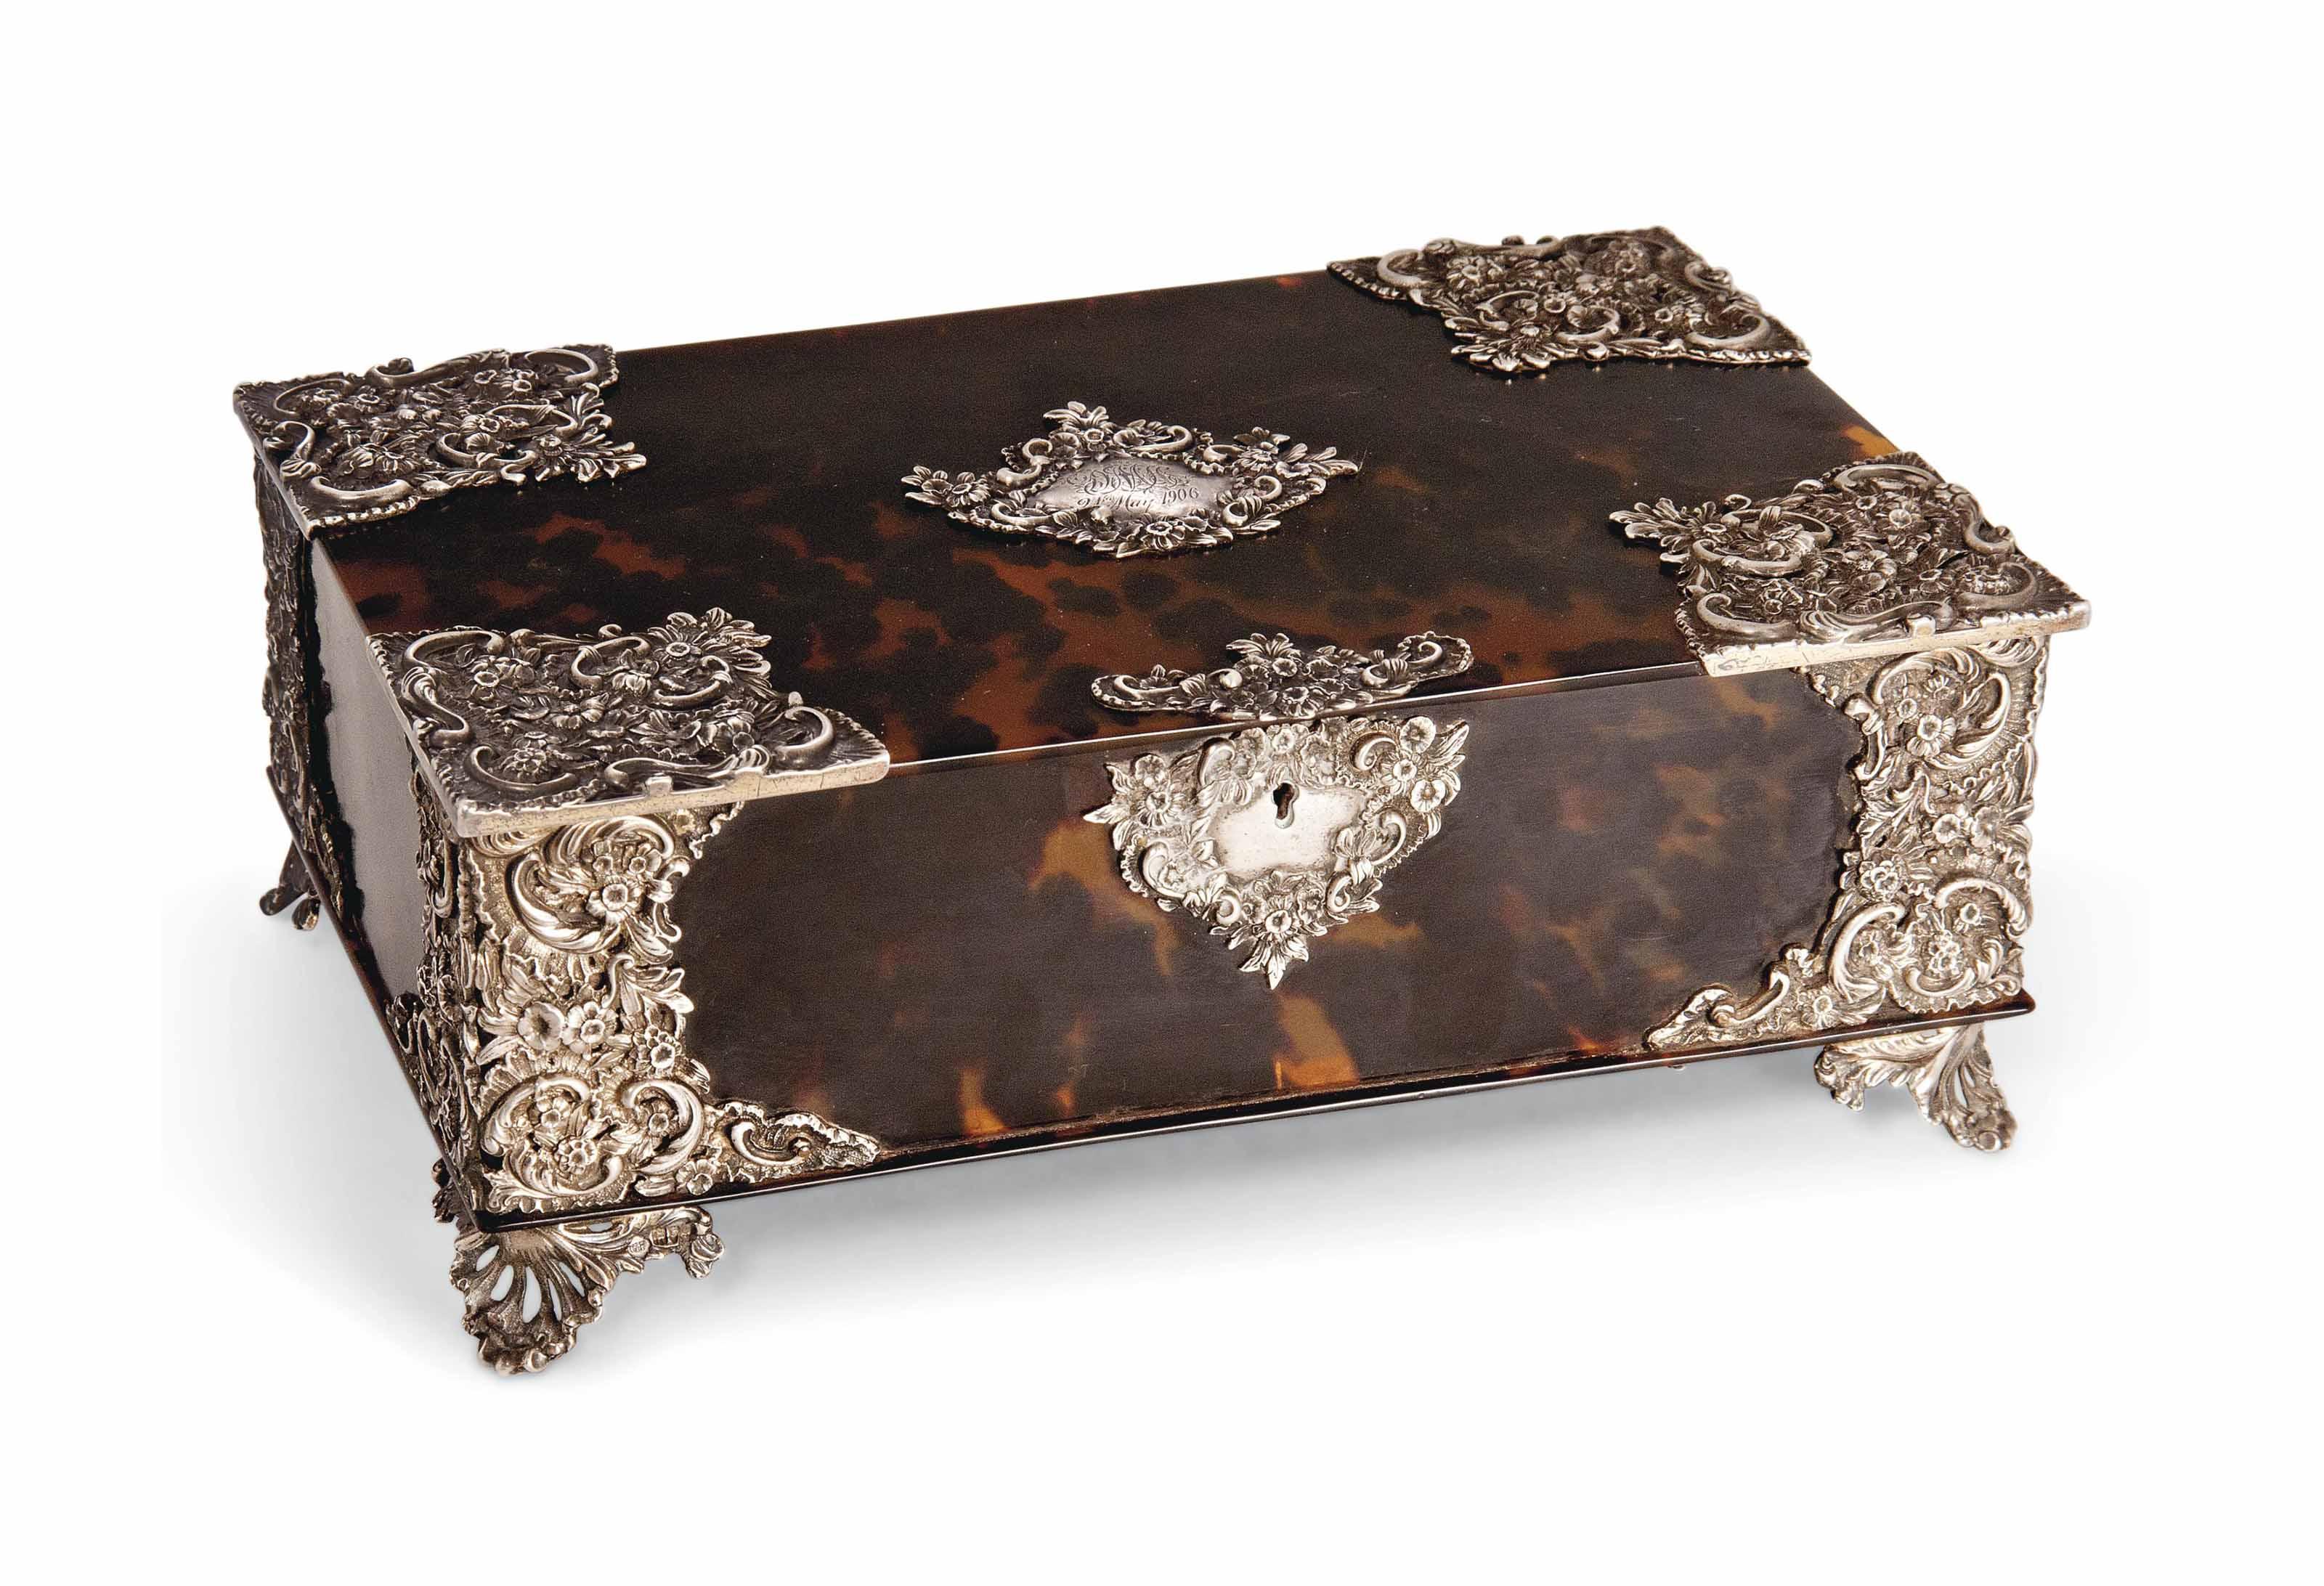 A LATE VICTORIAN SILVER-MOUNTED TORTOISESHELL BOX